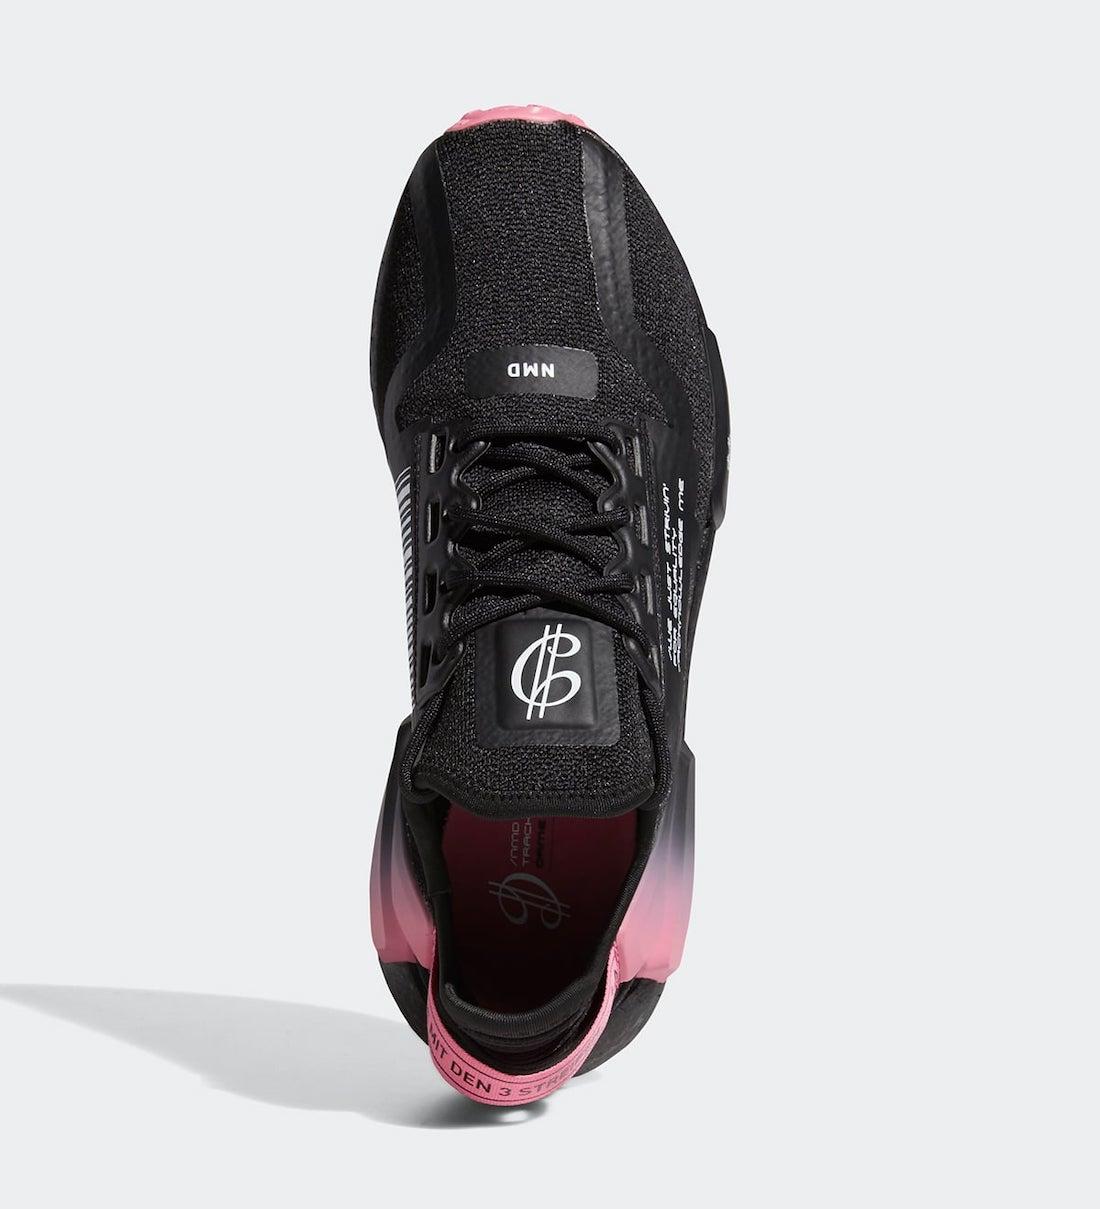 Damian Lillard adidas NMD R1 V2 GY3812 Release Date Info